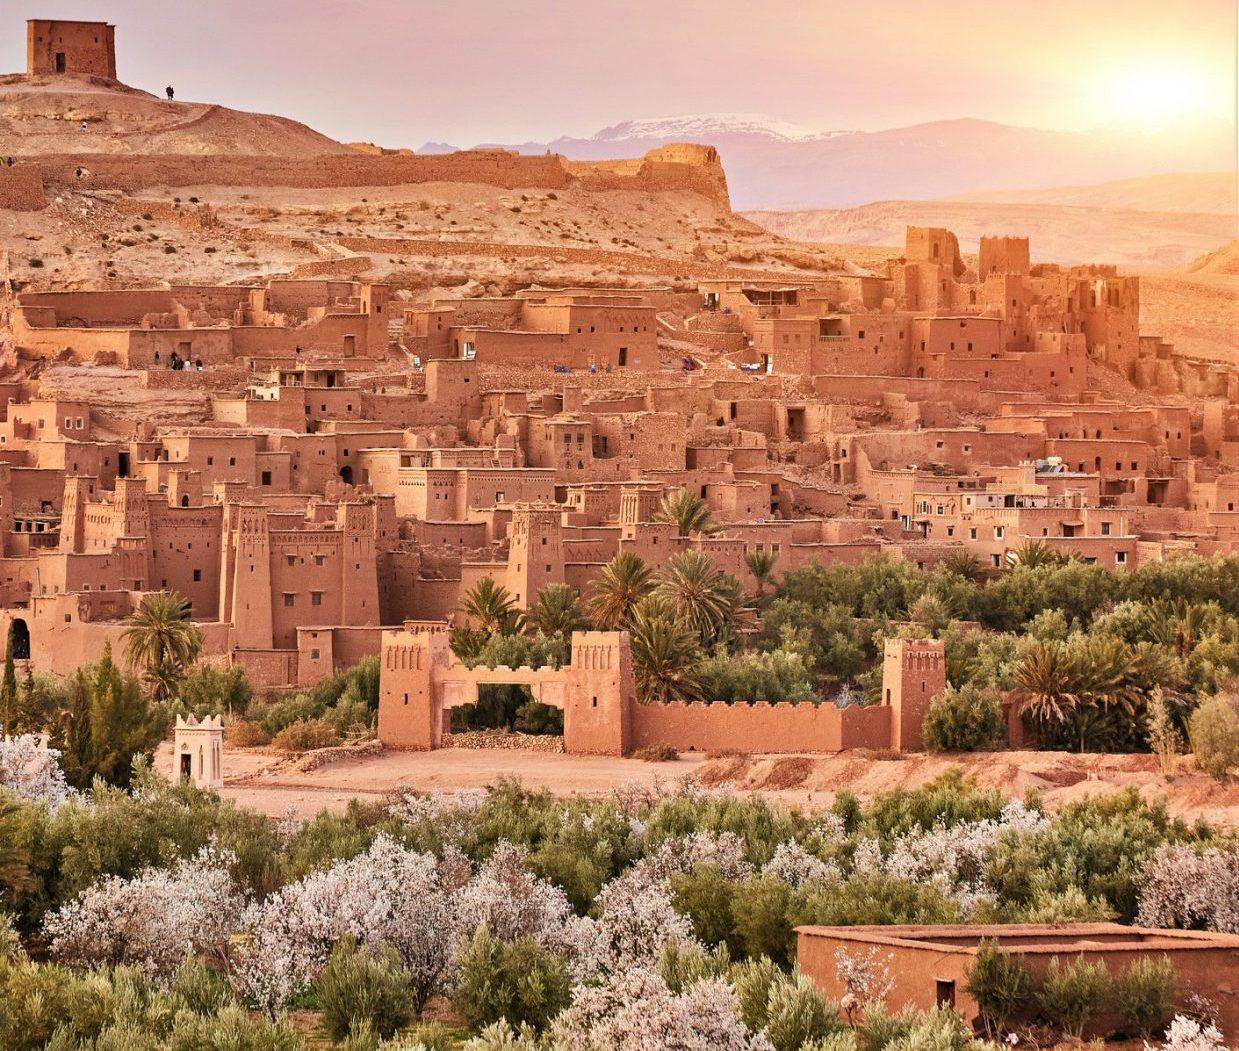 Marrakech - Merzouga - Fes - Chefchaouen 2